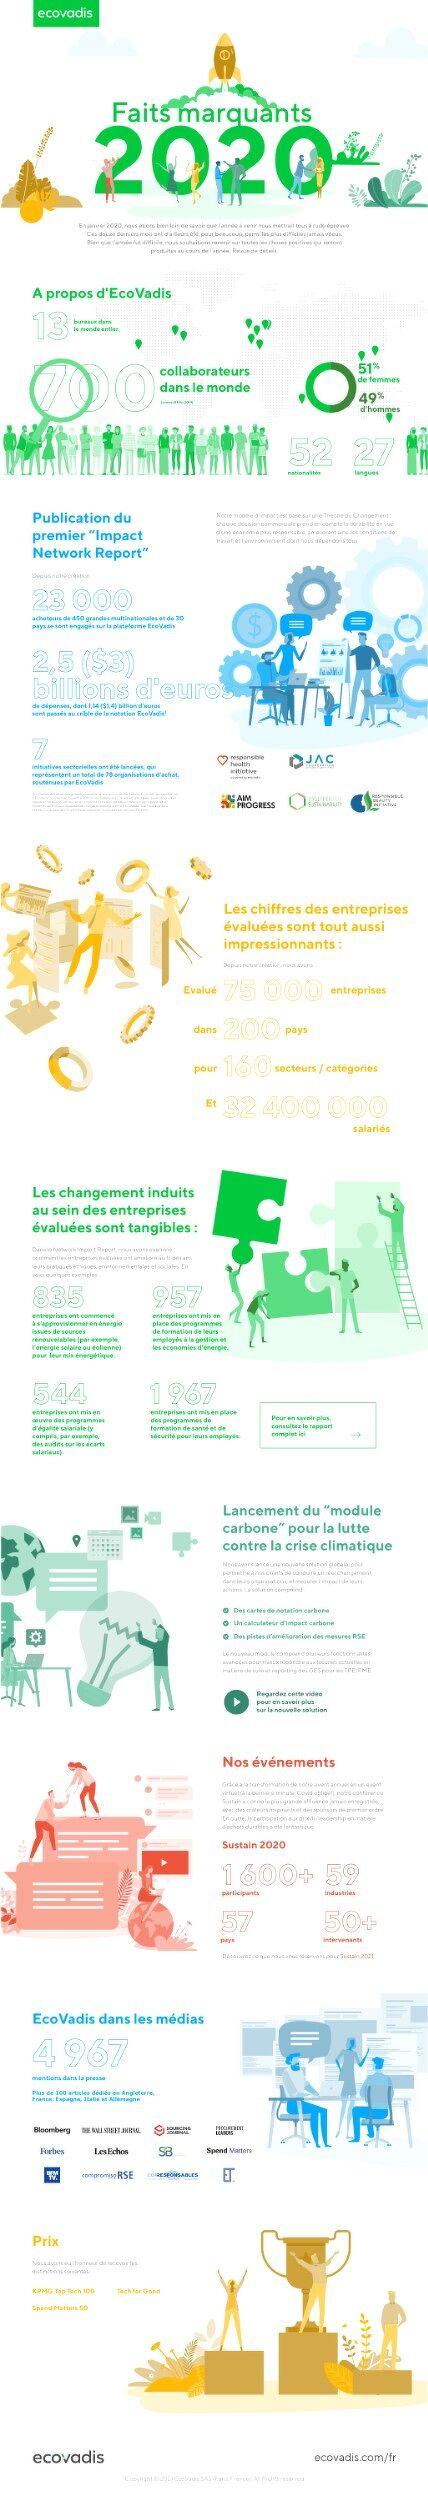 EcoVadis : Faits marquants 2020